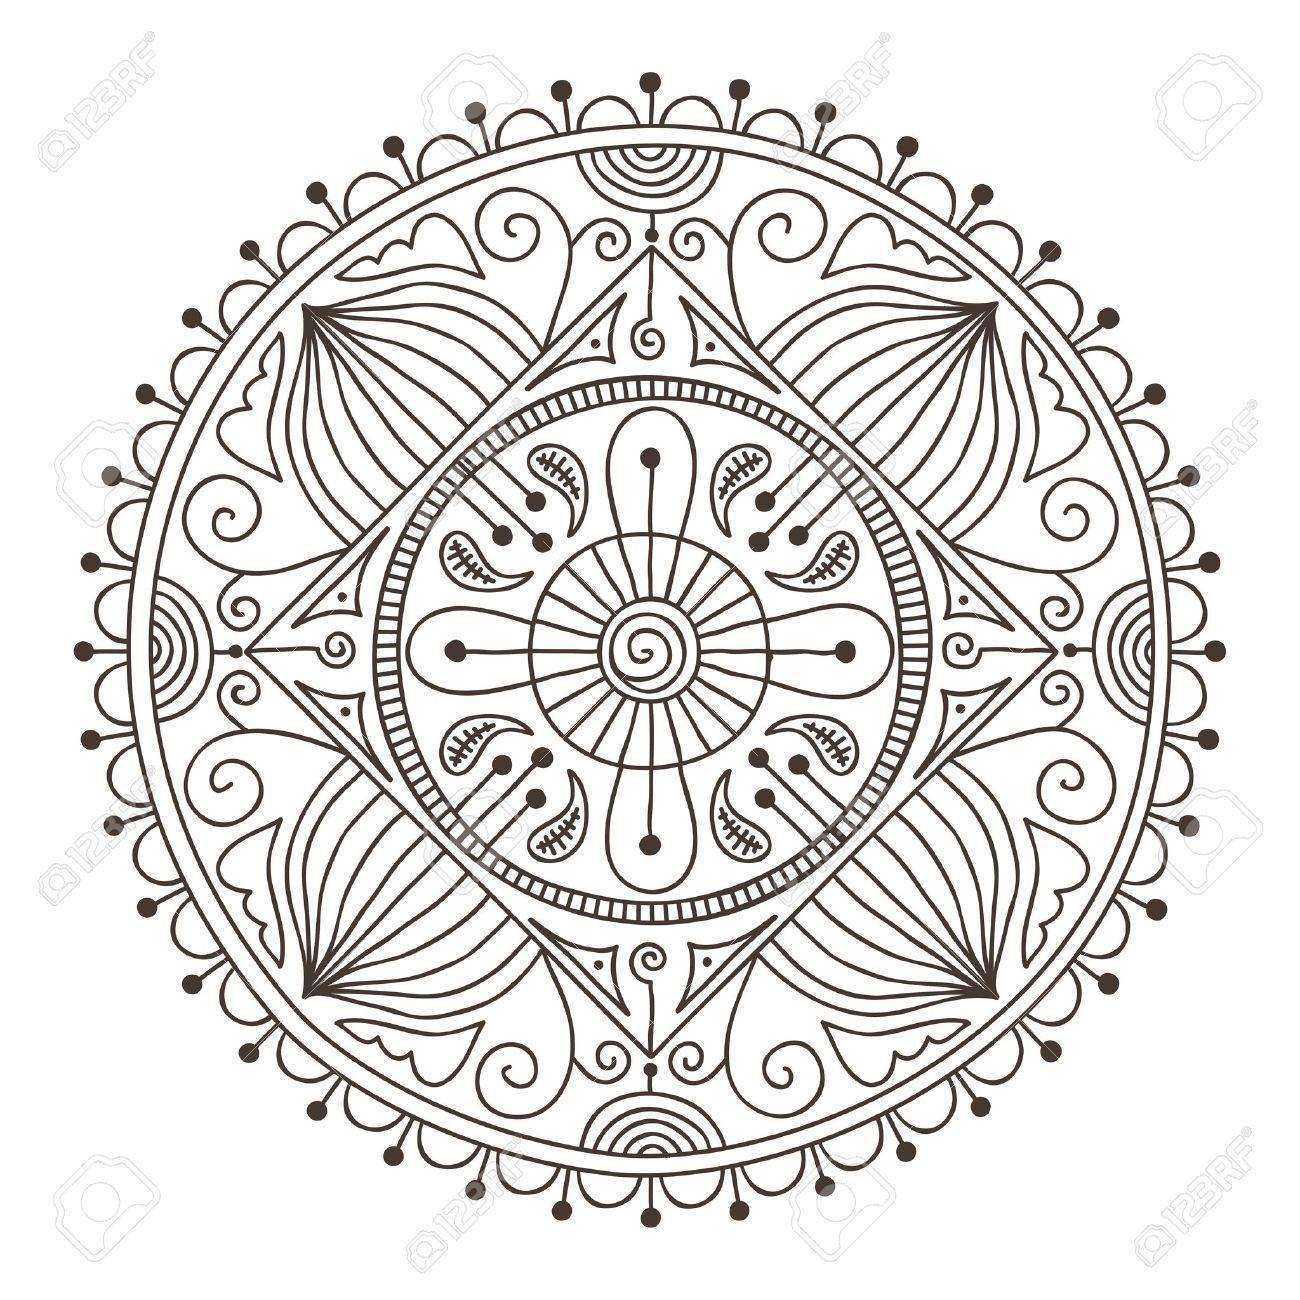 Beautiful Hand Drawn Doodle Mandala Royalty Free Cliparts